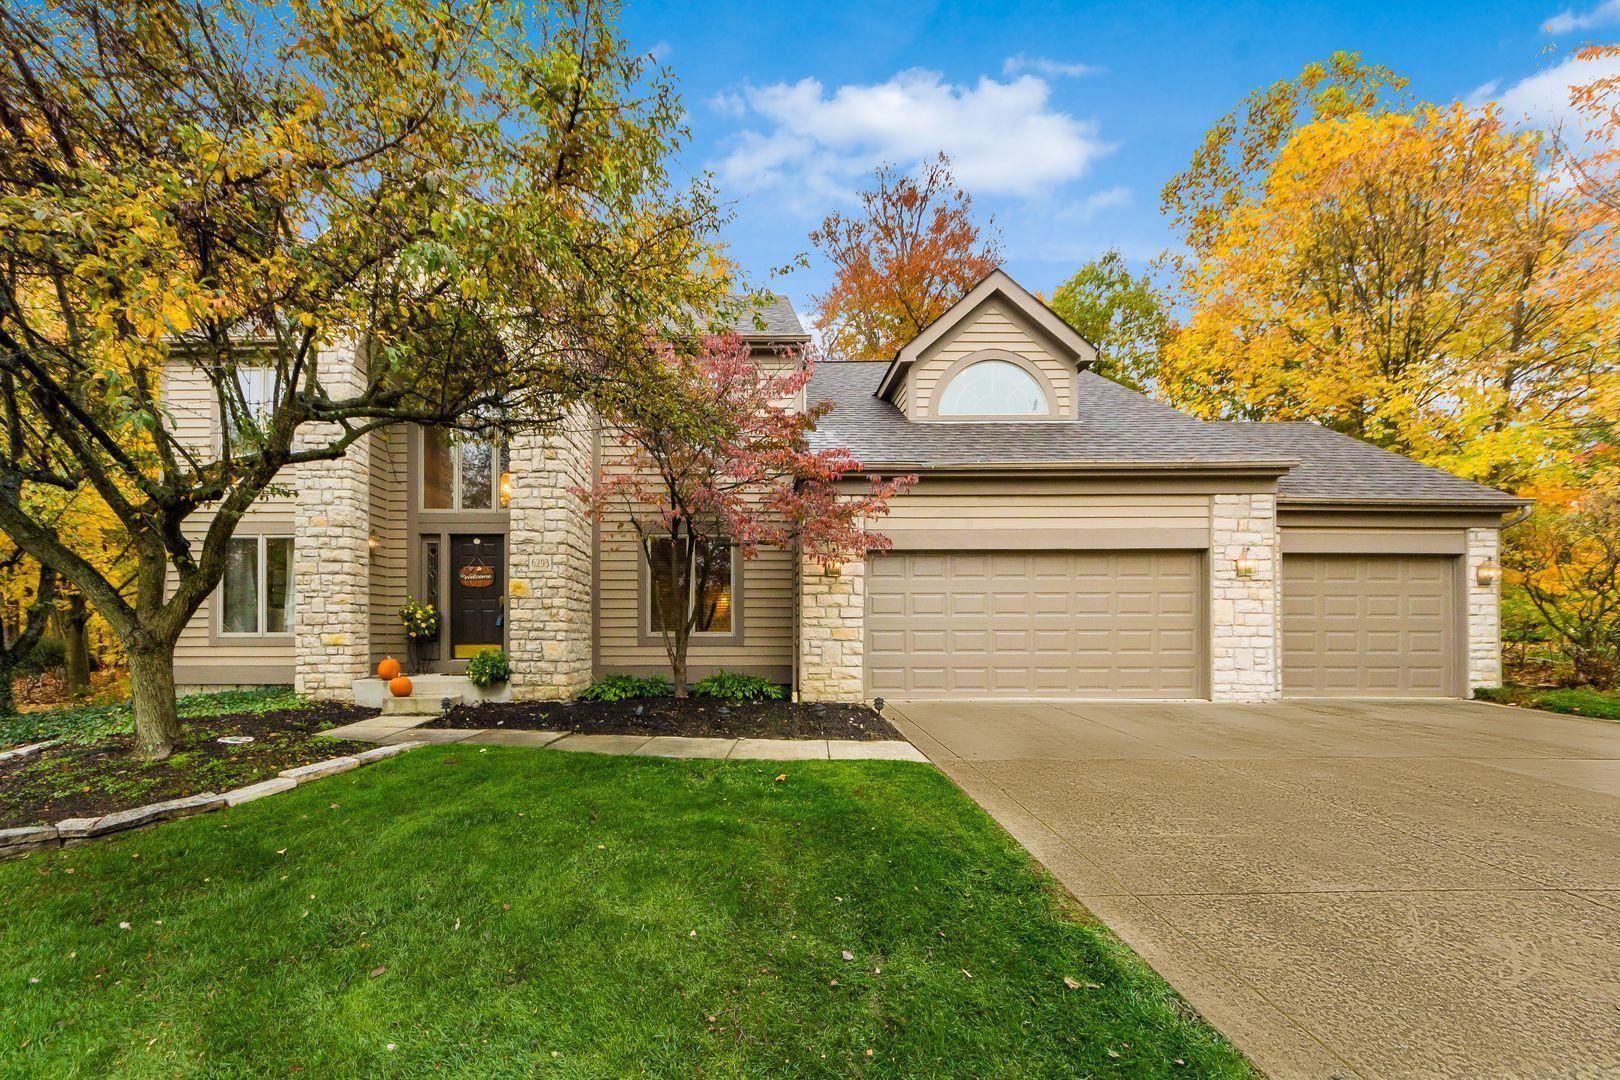 Photo of 6293 Oak Ridge Place, Westerville, OH 43082 (MLS # 220038418)